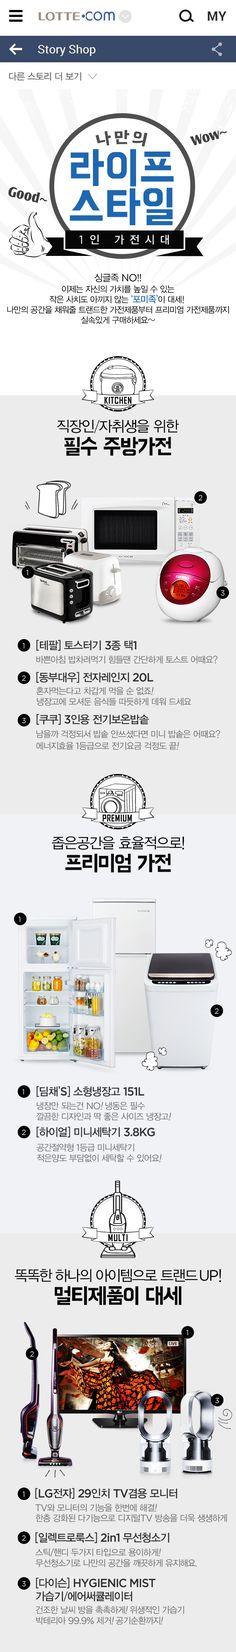 lotte.com_스토리샵_1인가전시대_151009_designed by 박지원